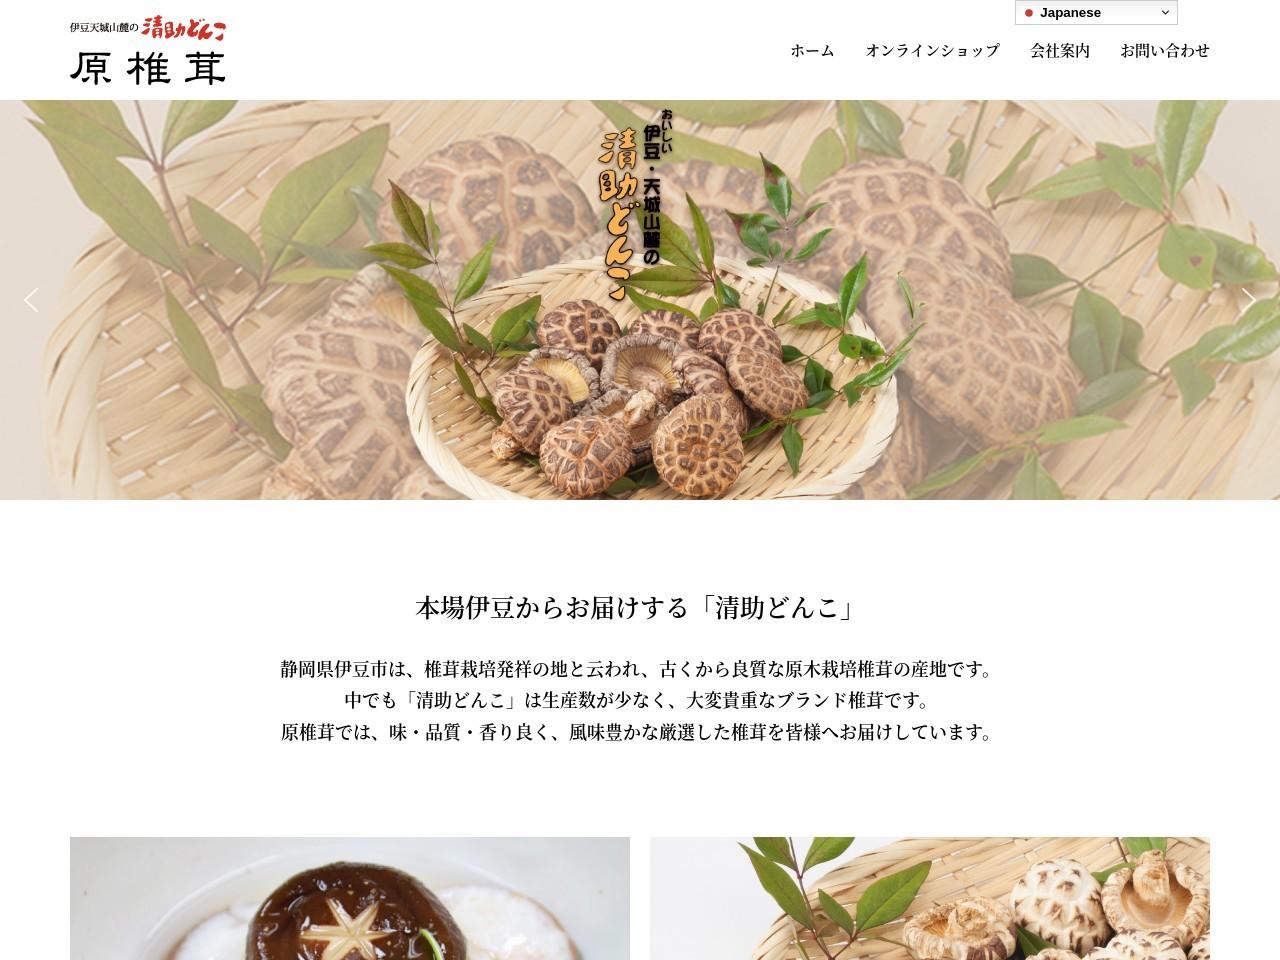 静岡県伊豆地域より厳選した椎茸販売 | 有限会社 原椎茸